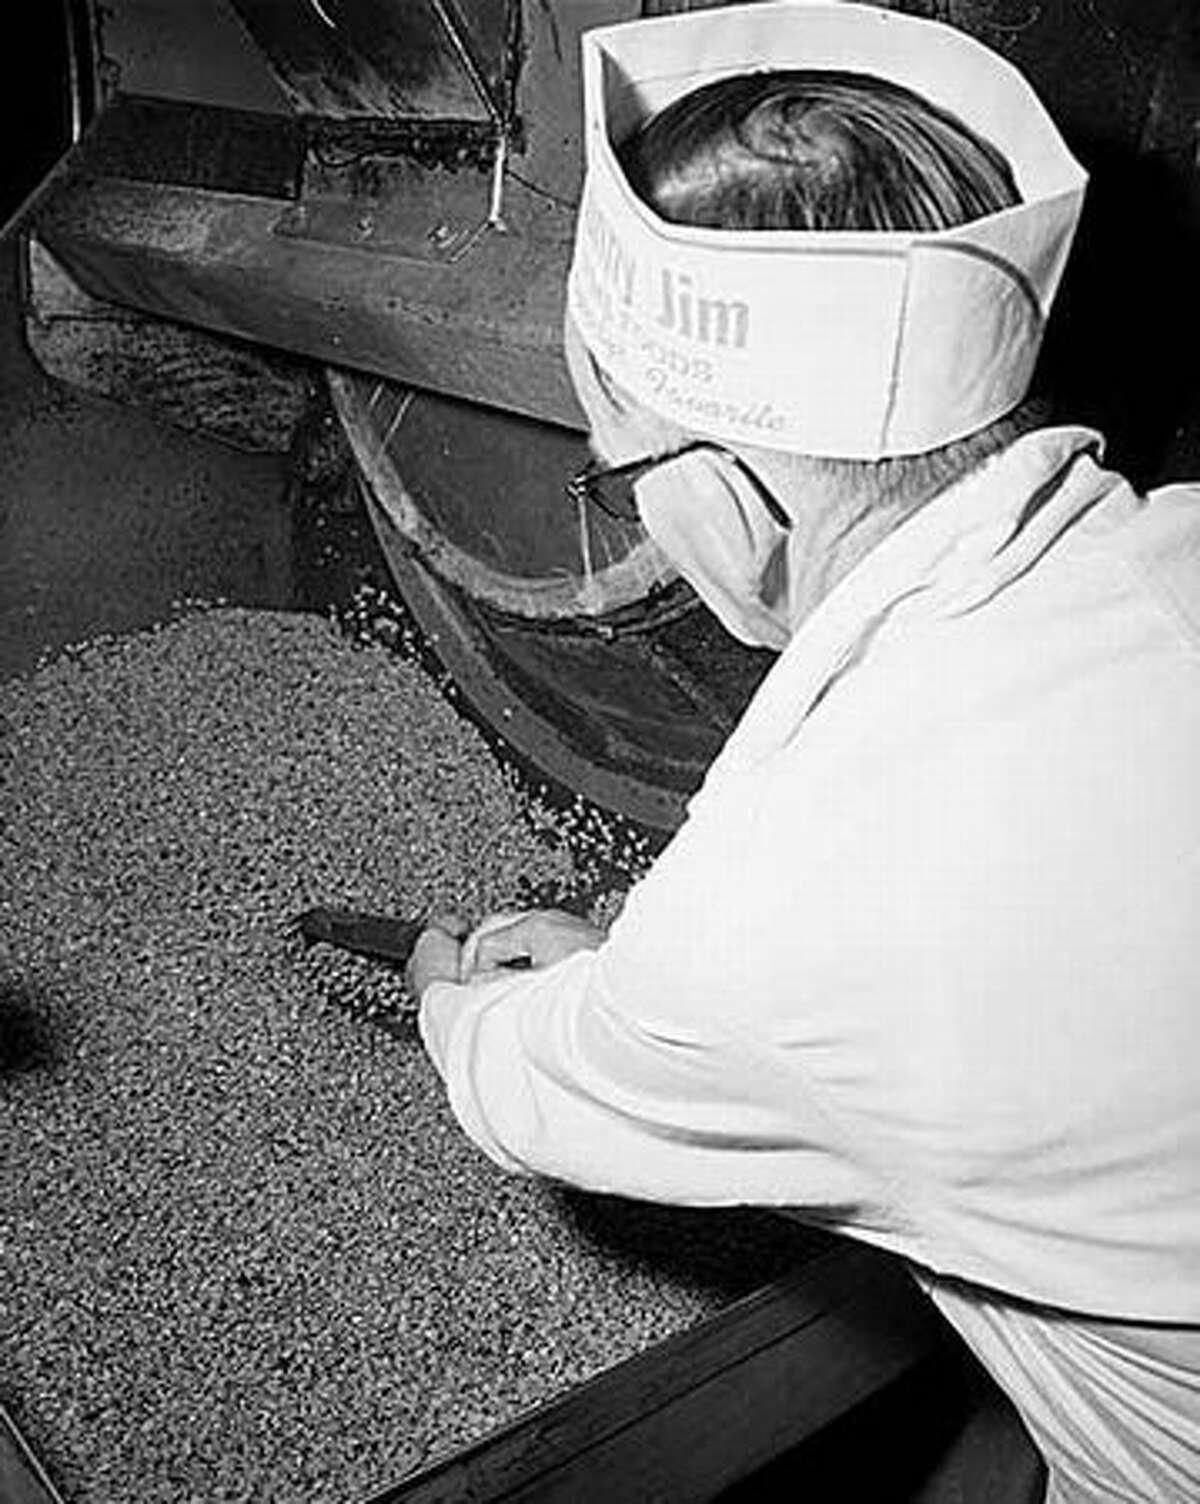 A 1967 photo from the Sunny Jim plant. (Seattlepi.com file/MOHAI)